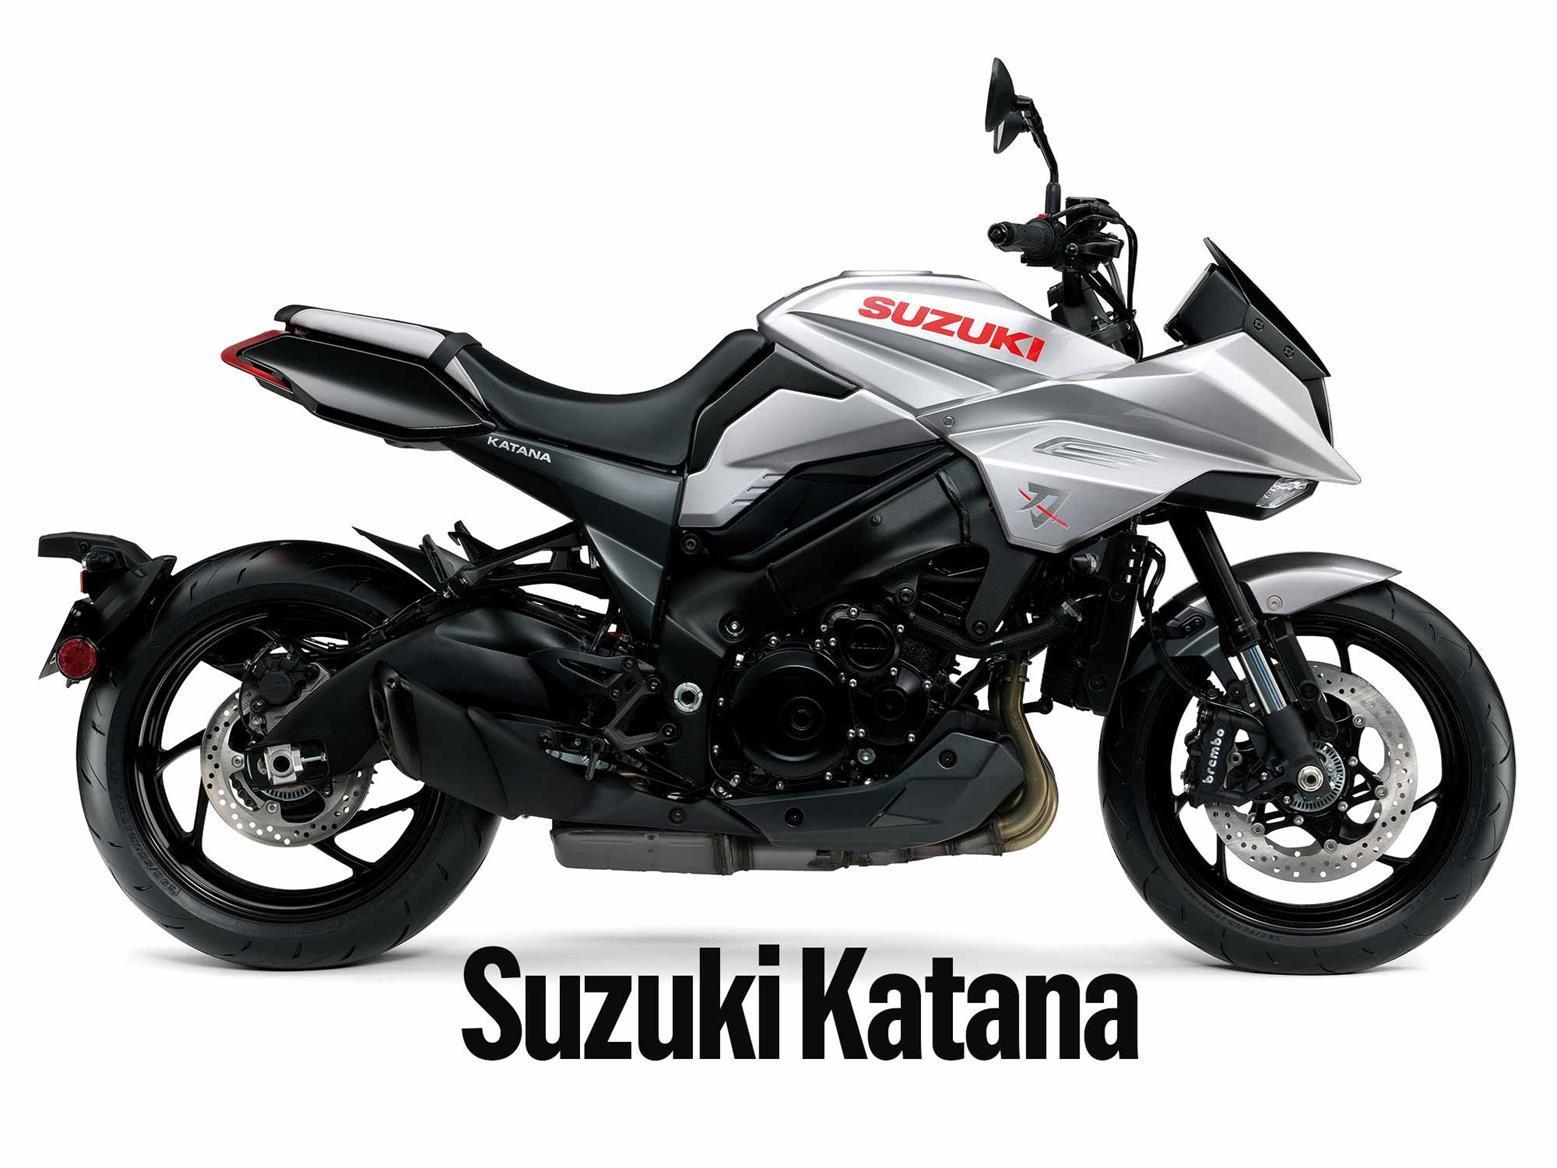 Read MCN's detailed Suzuki Katana long-term test review here